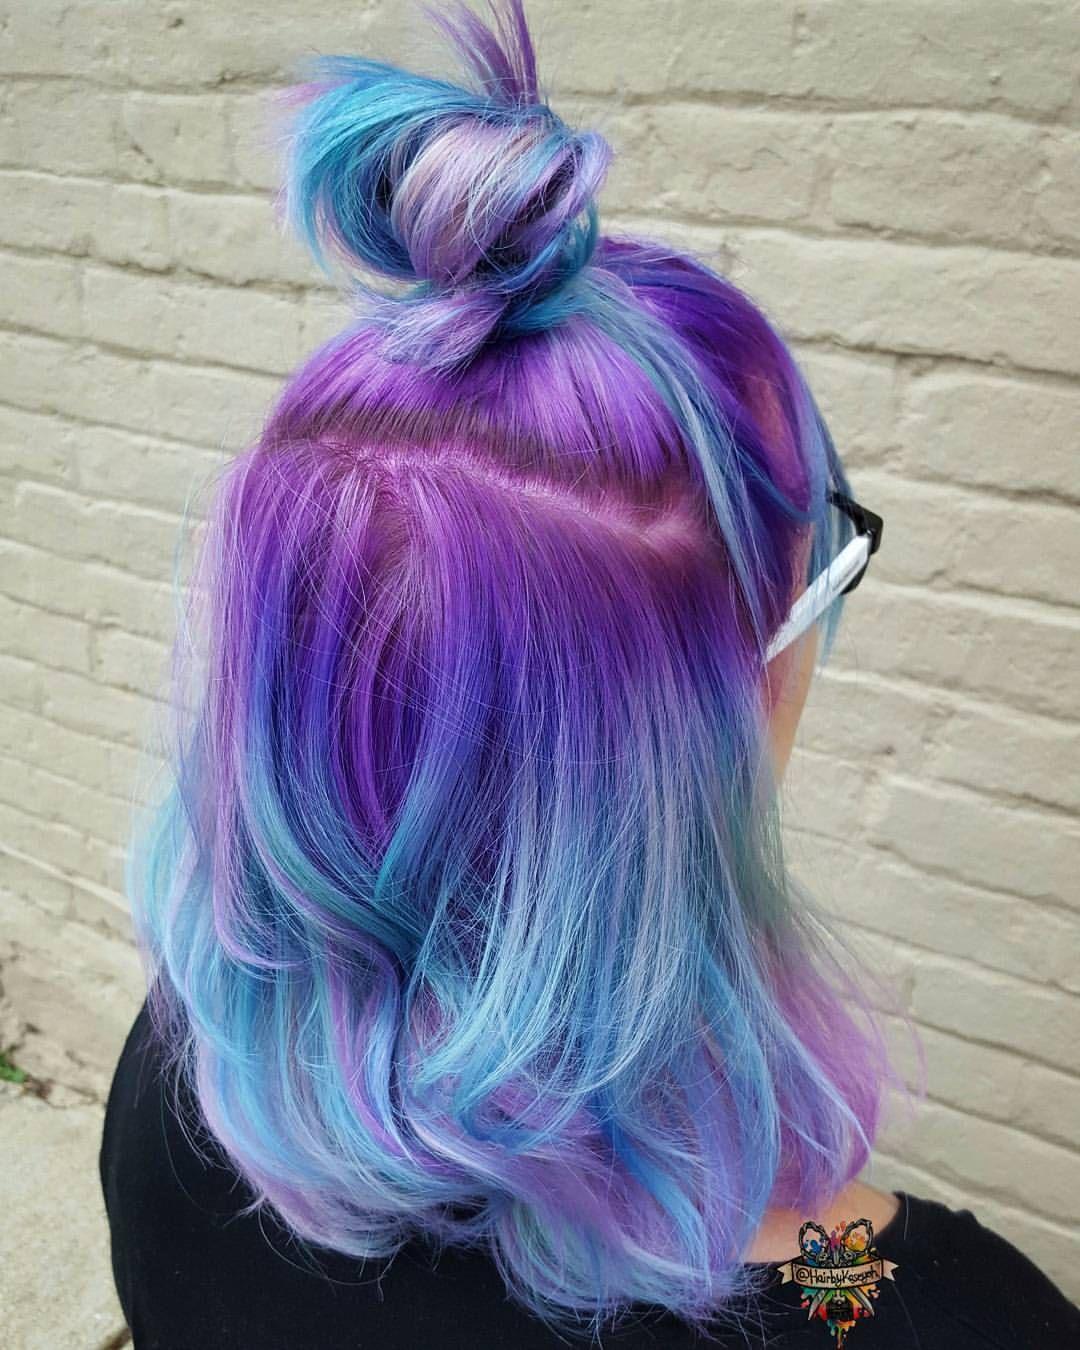 Pin by breanna yates on hair n nails pinterest instagram hair